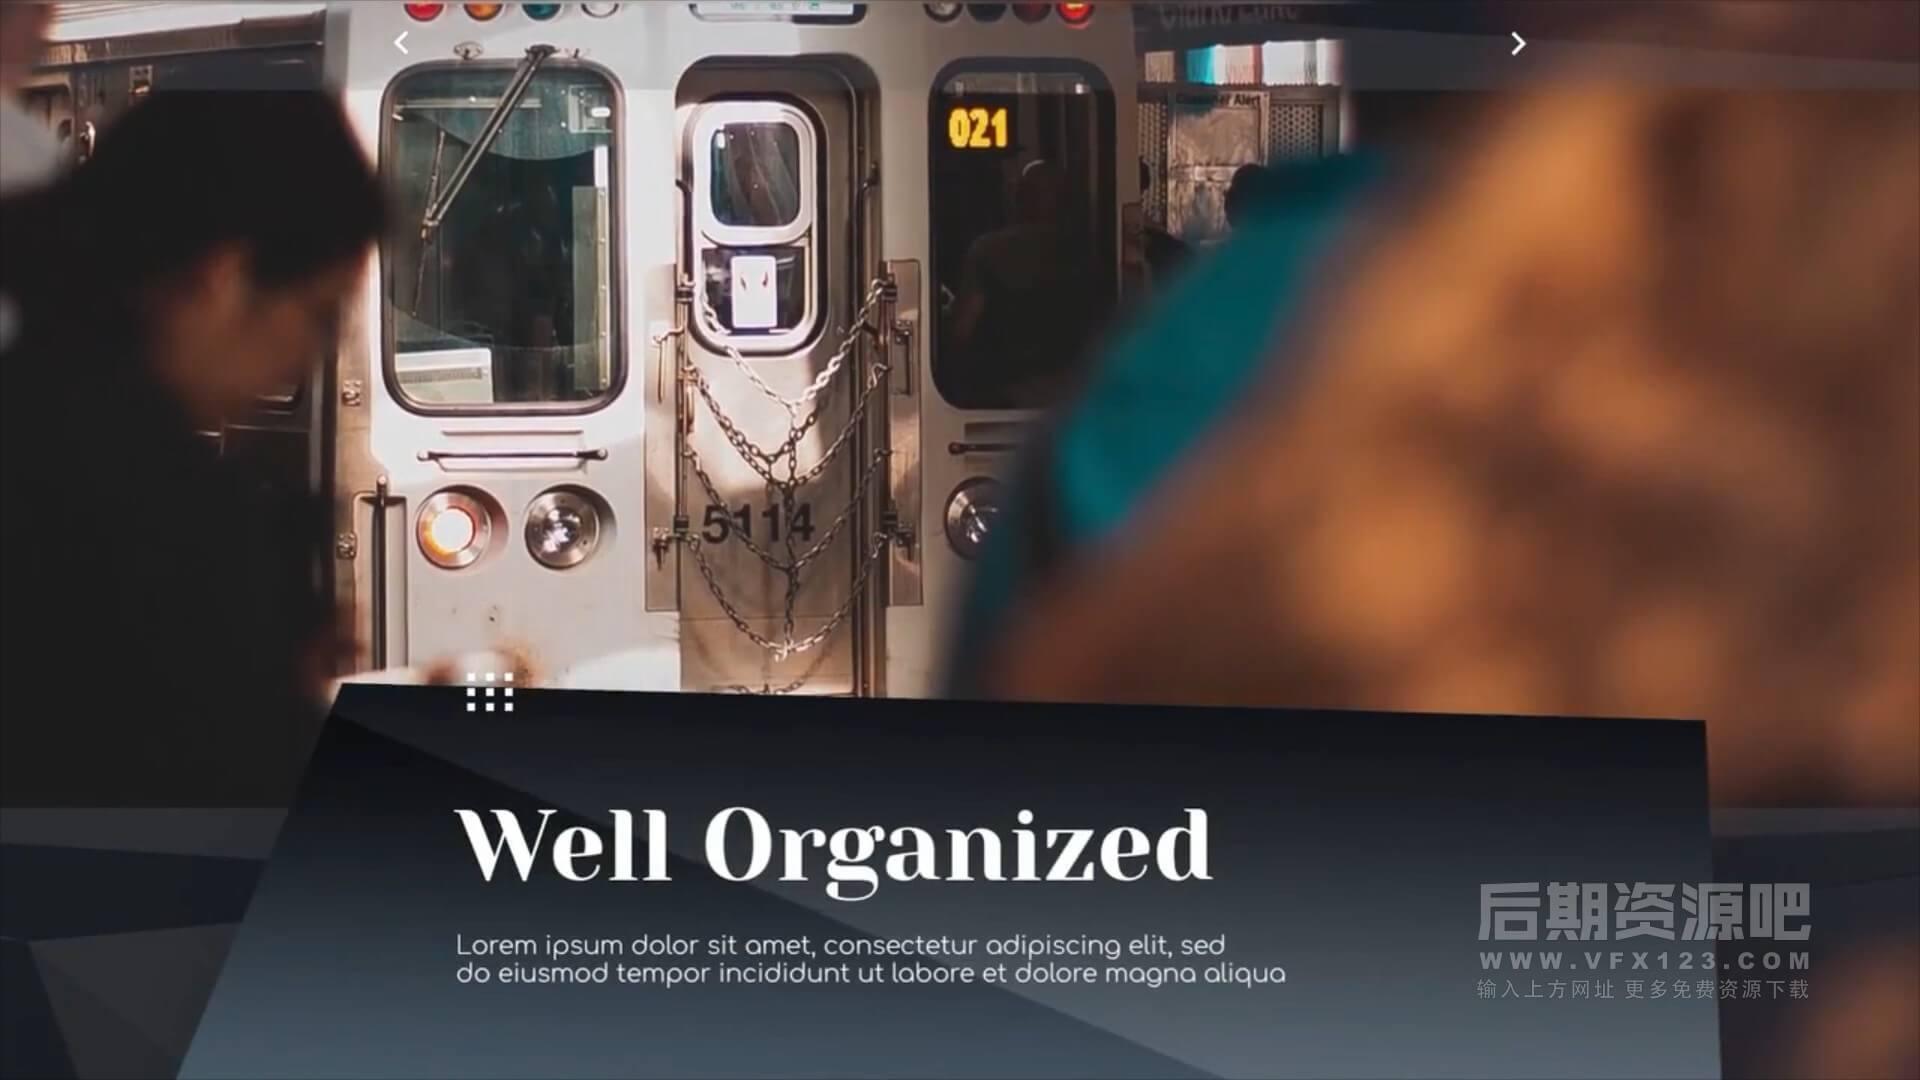 fcpx主题模板 商务类型简报演示文稿图文展示片头 Corporate Clean Presentation